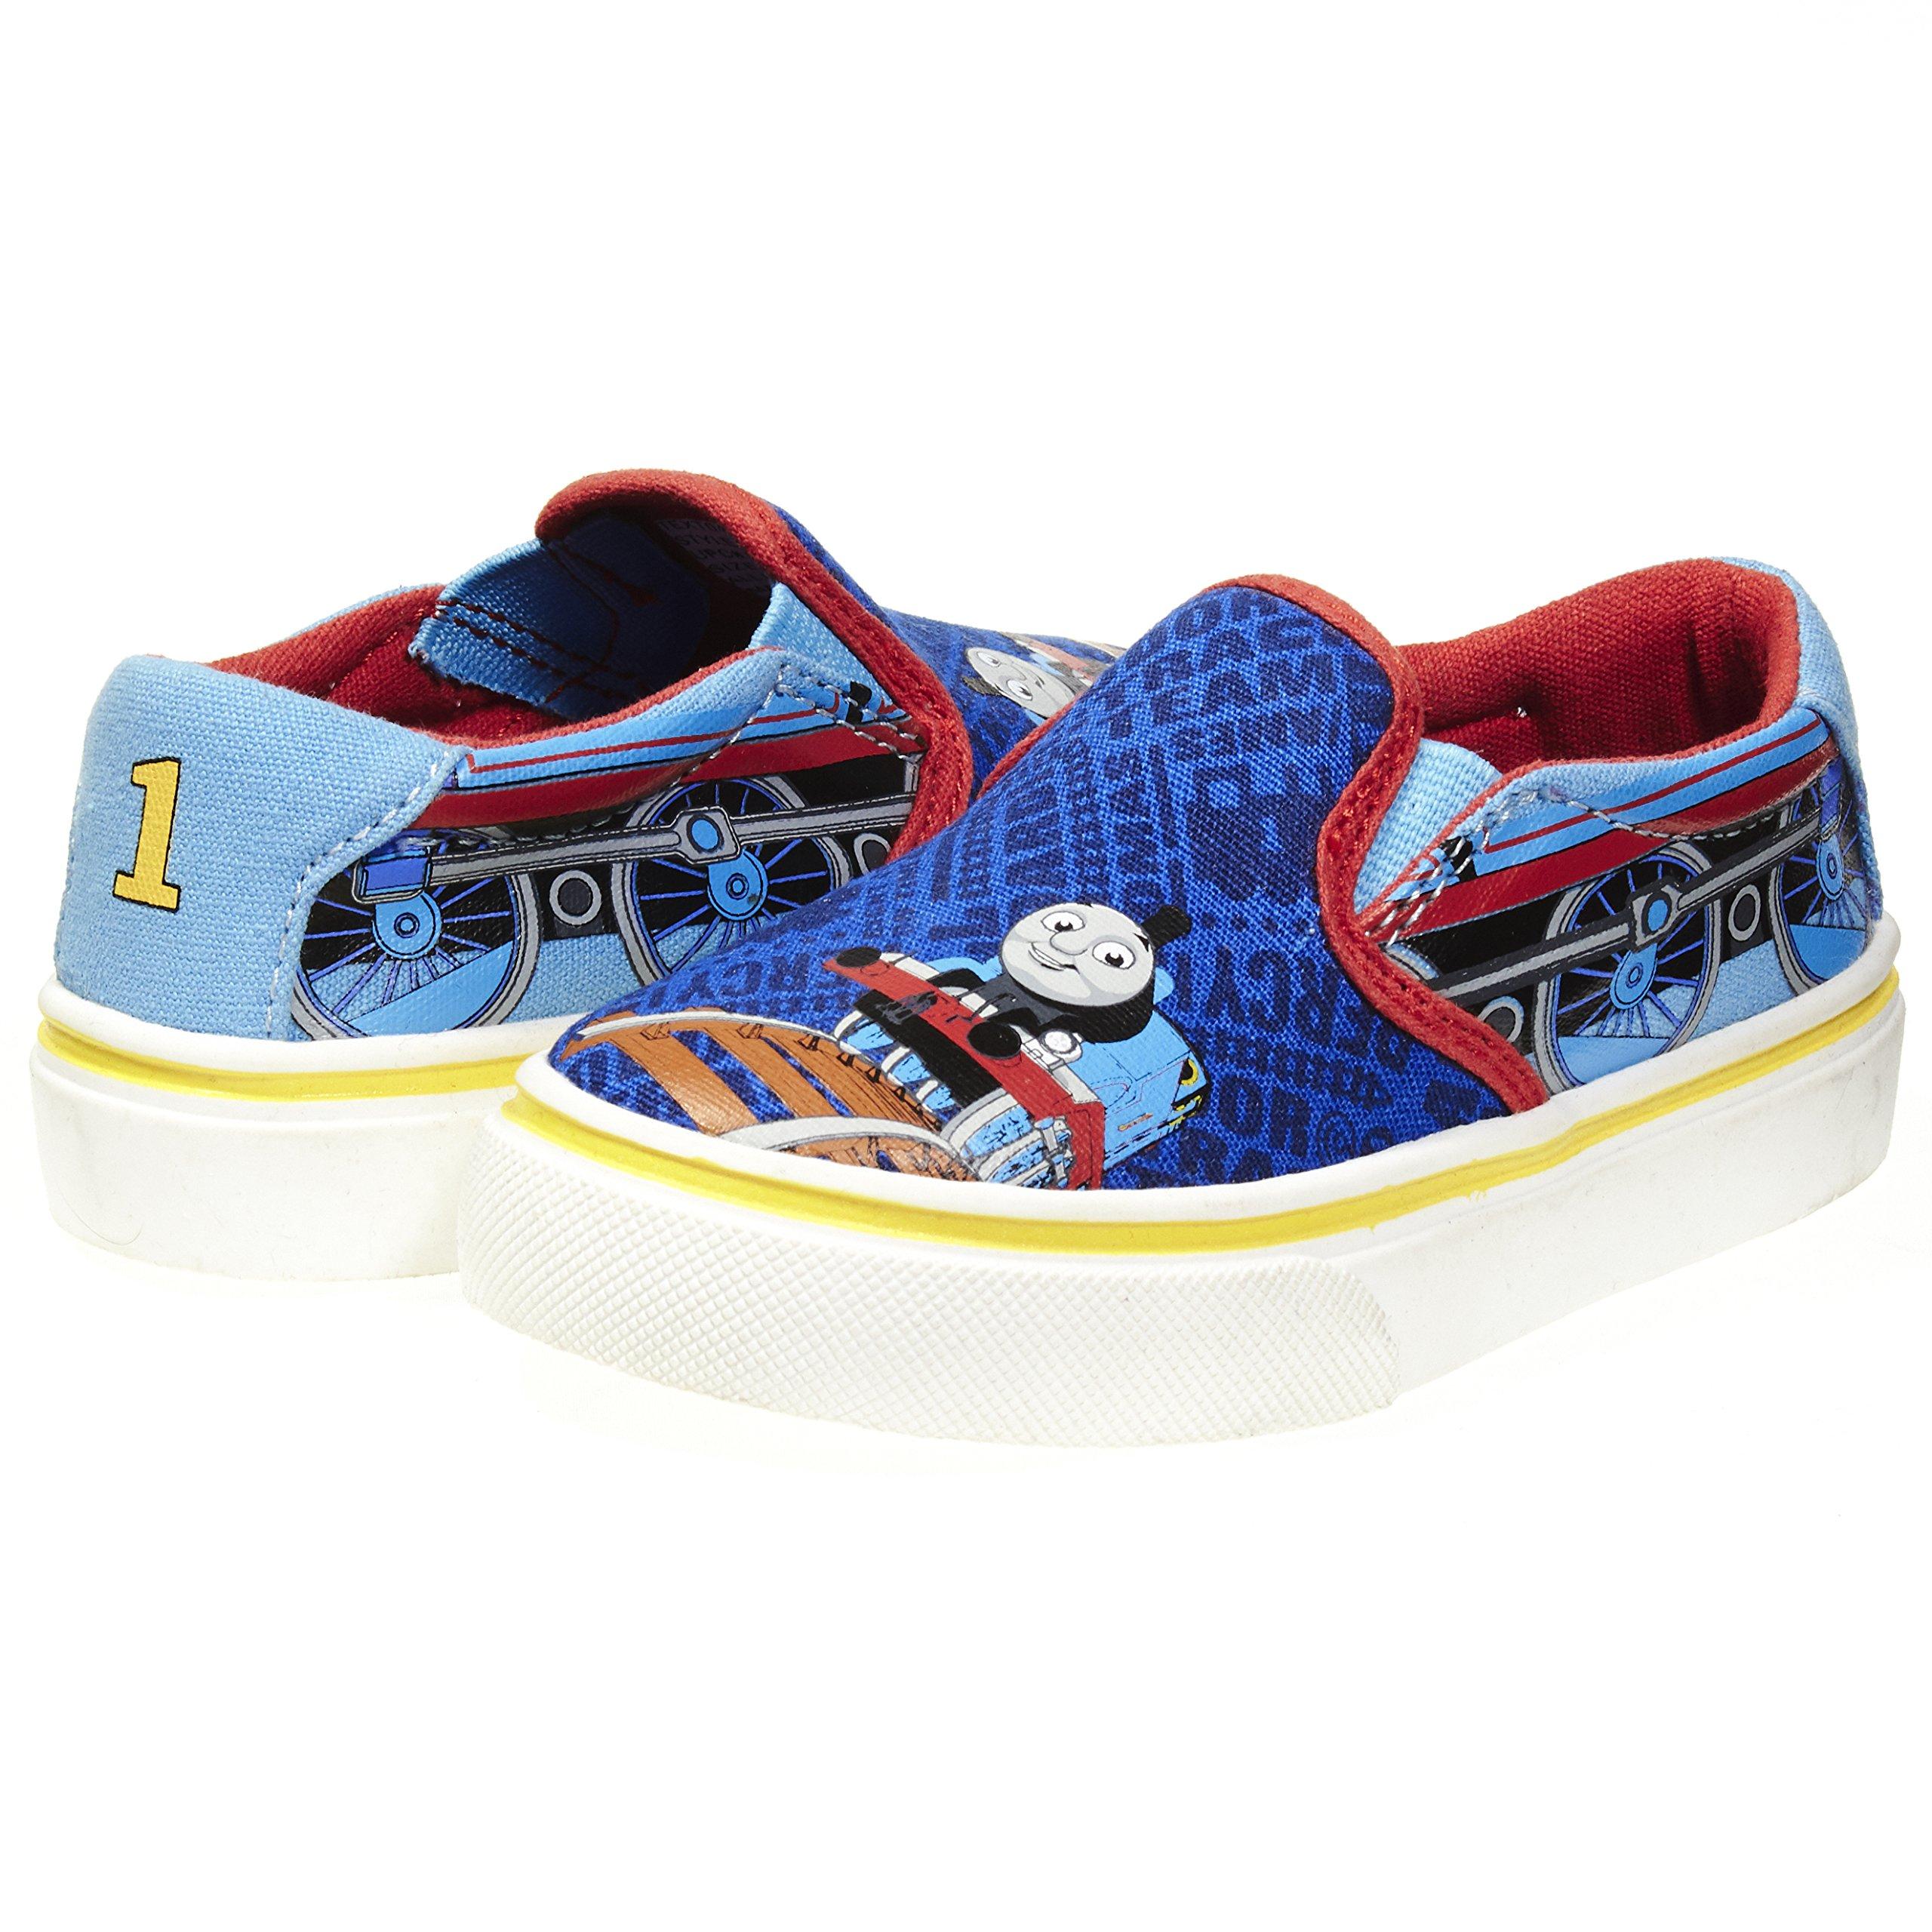 Friends Toddler Boy Shoes; Sl